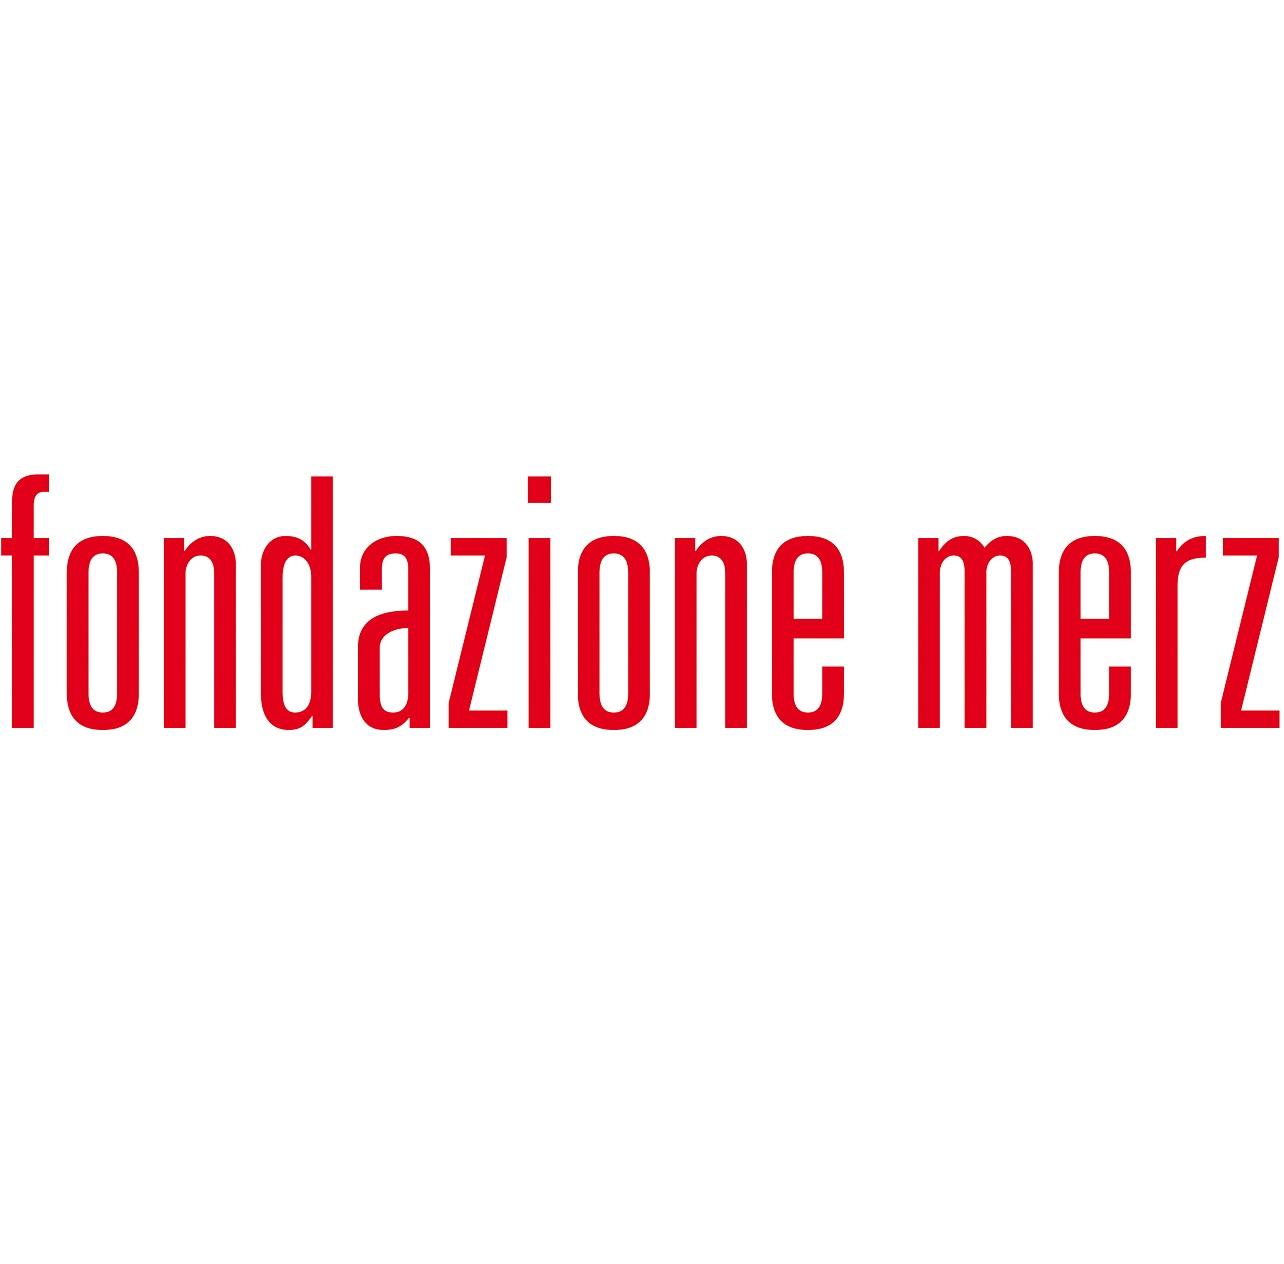 Fondazione Merz